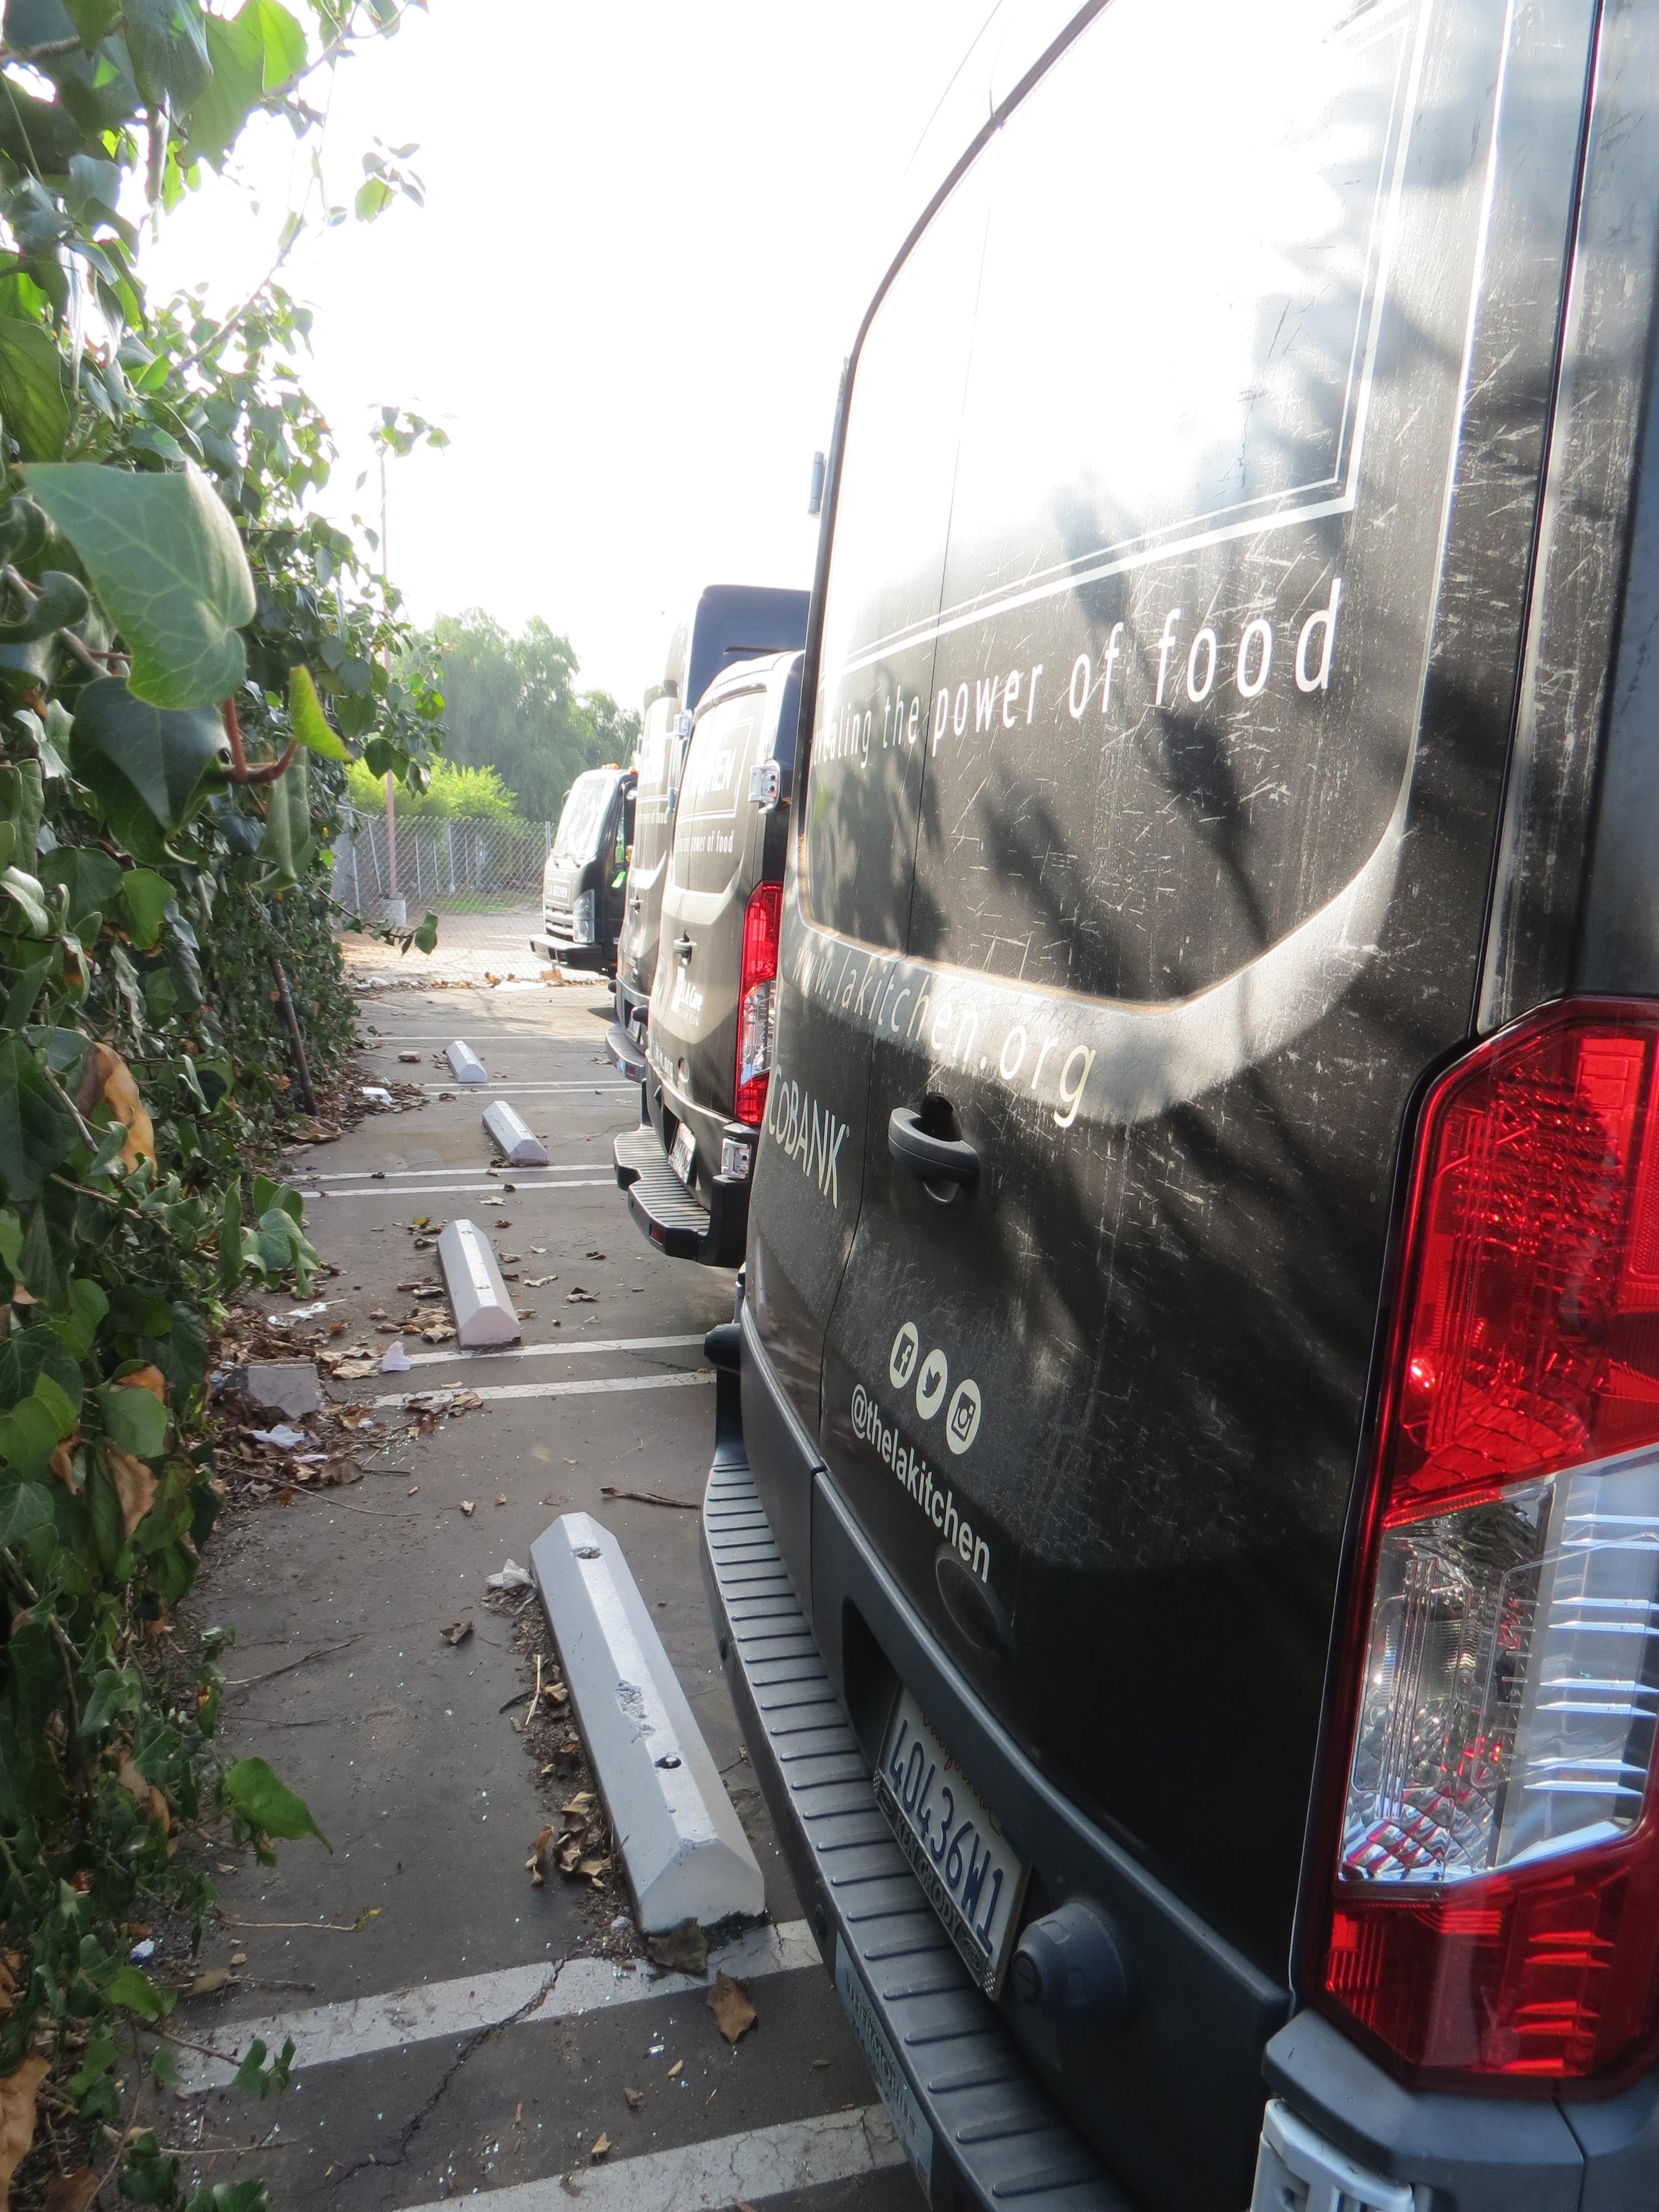 Lot 2 - 2015, FORD TRANSIT 250 REFRIGERATED VAN, HIGH ROOF, SLIDING DOOR, CUSTOM WRAP, 14,223 MILES, VIN: